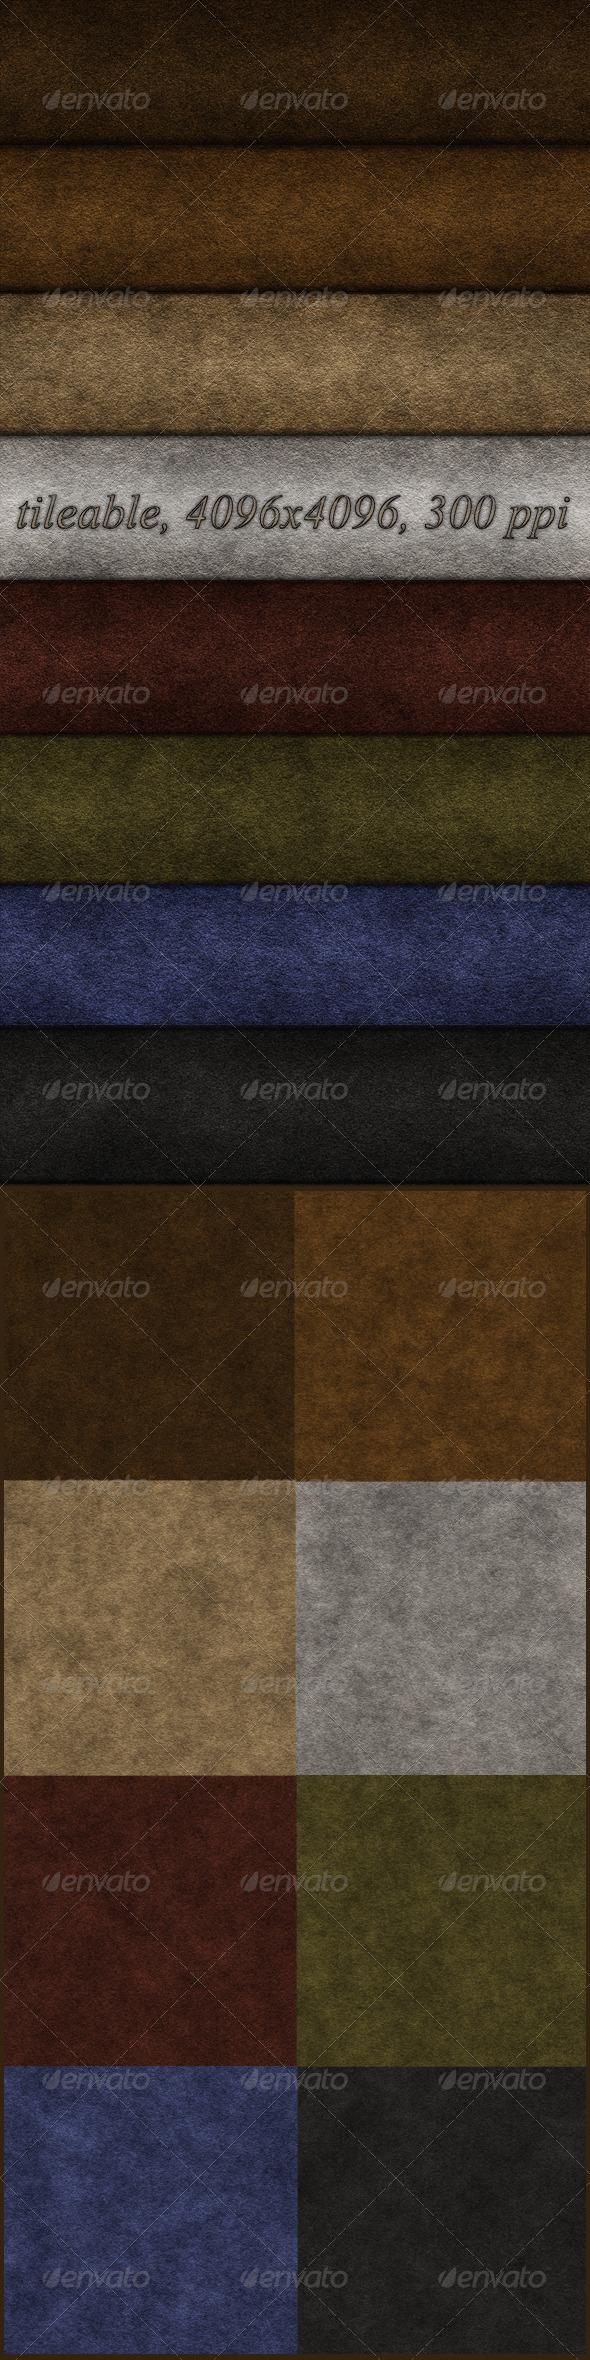 8 Suede Textures - Fabric Textures